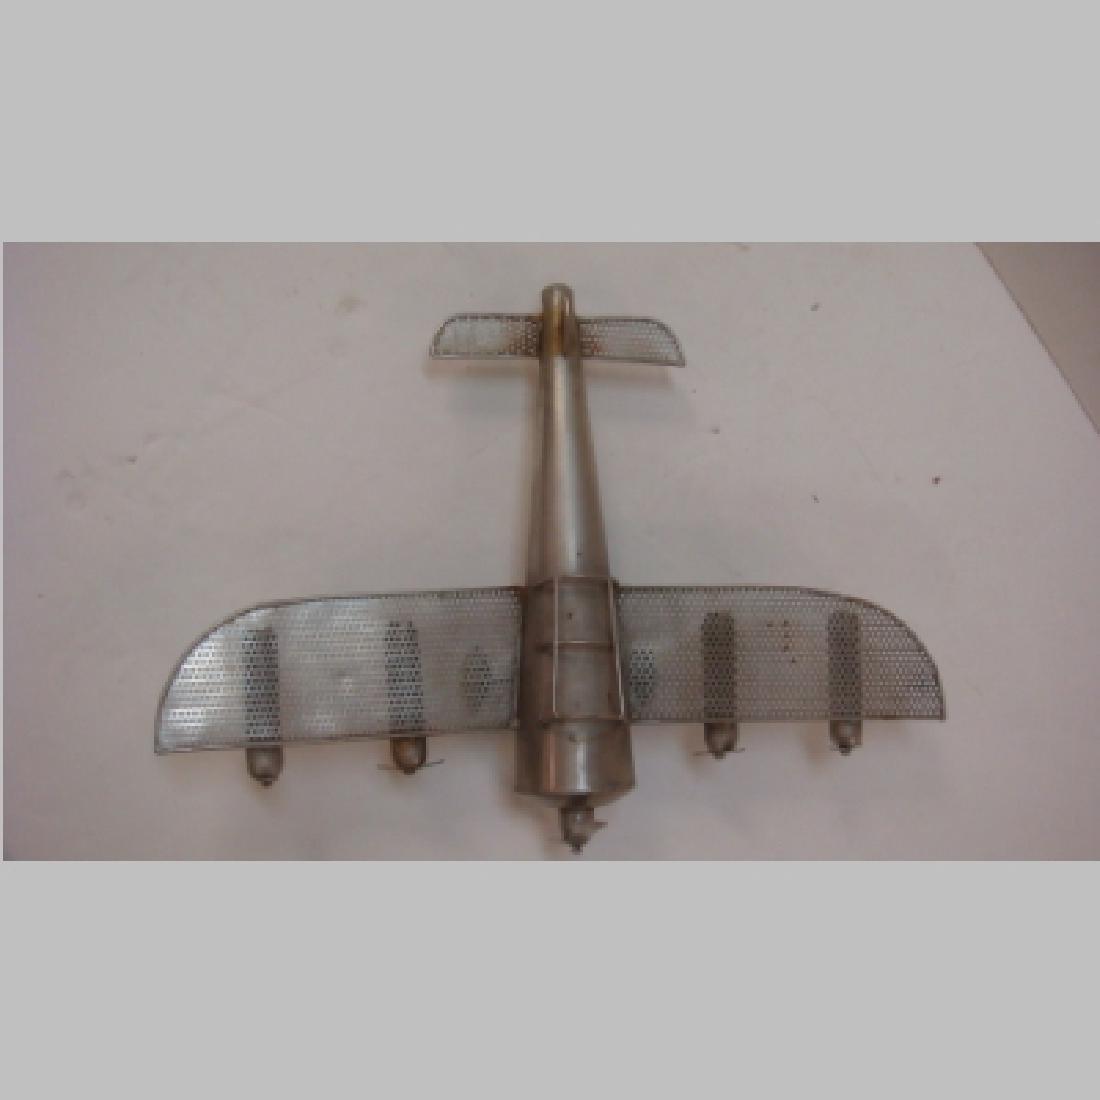 WW II Era Silver Metal Toy Five Engine Bomber: - 4